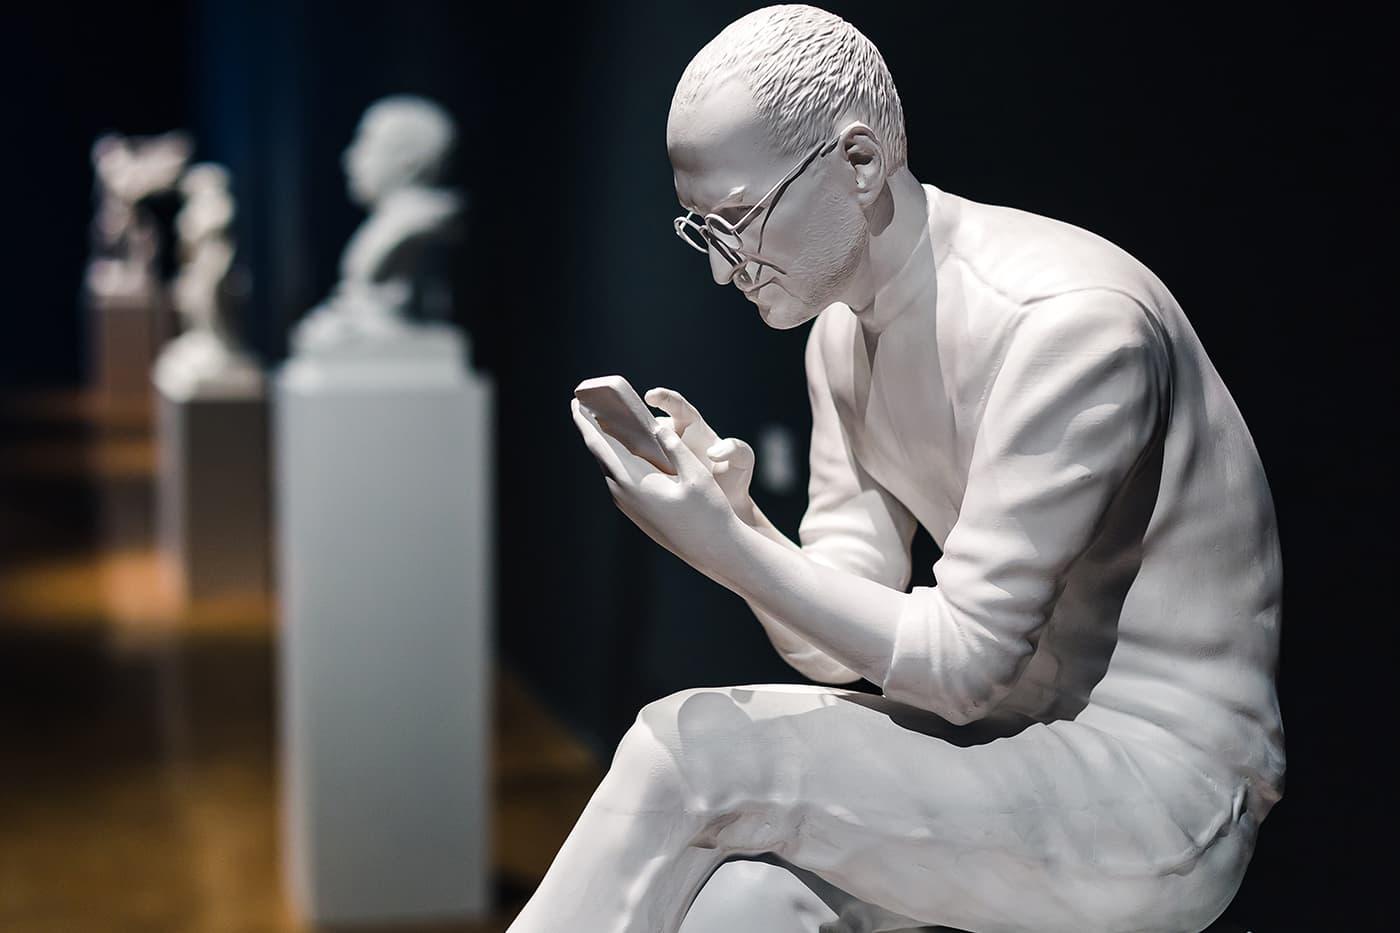 Sebastian Errazuriz Sculpts Mark Zuckerberg, Steve Jobs & Elon Musk as Roman Emperors